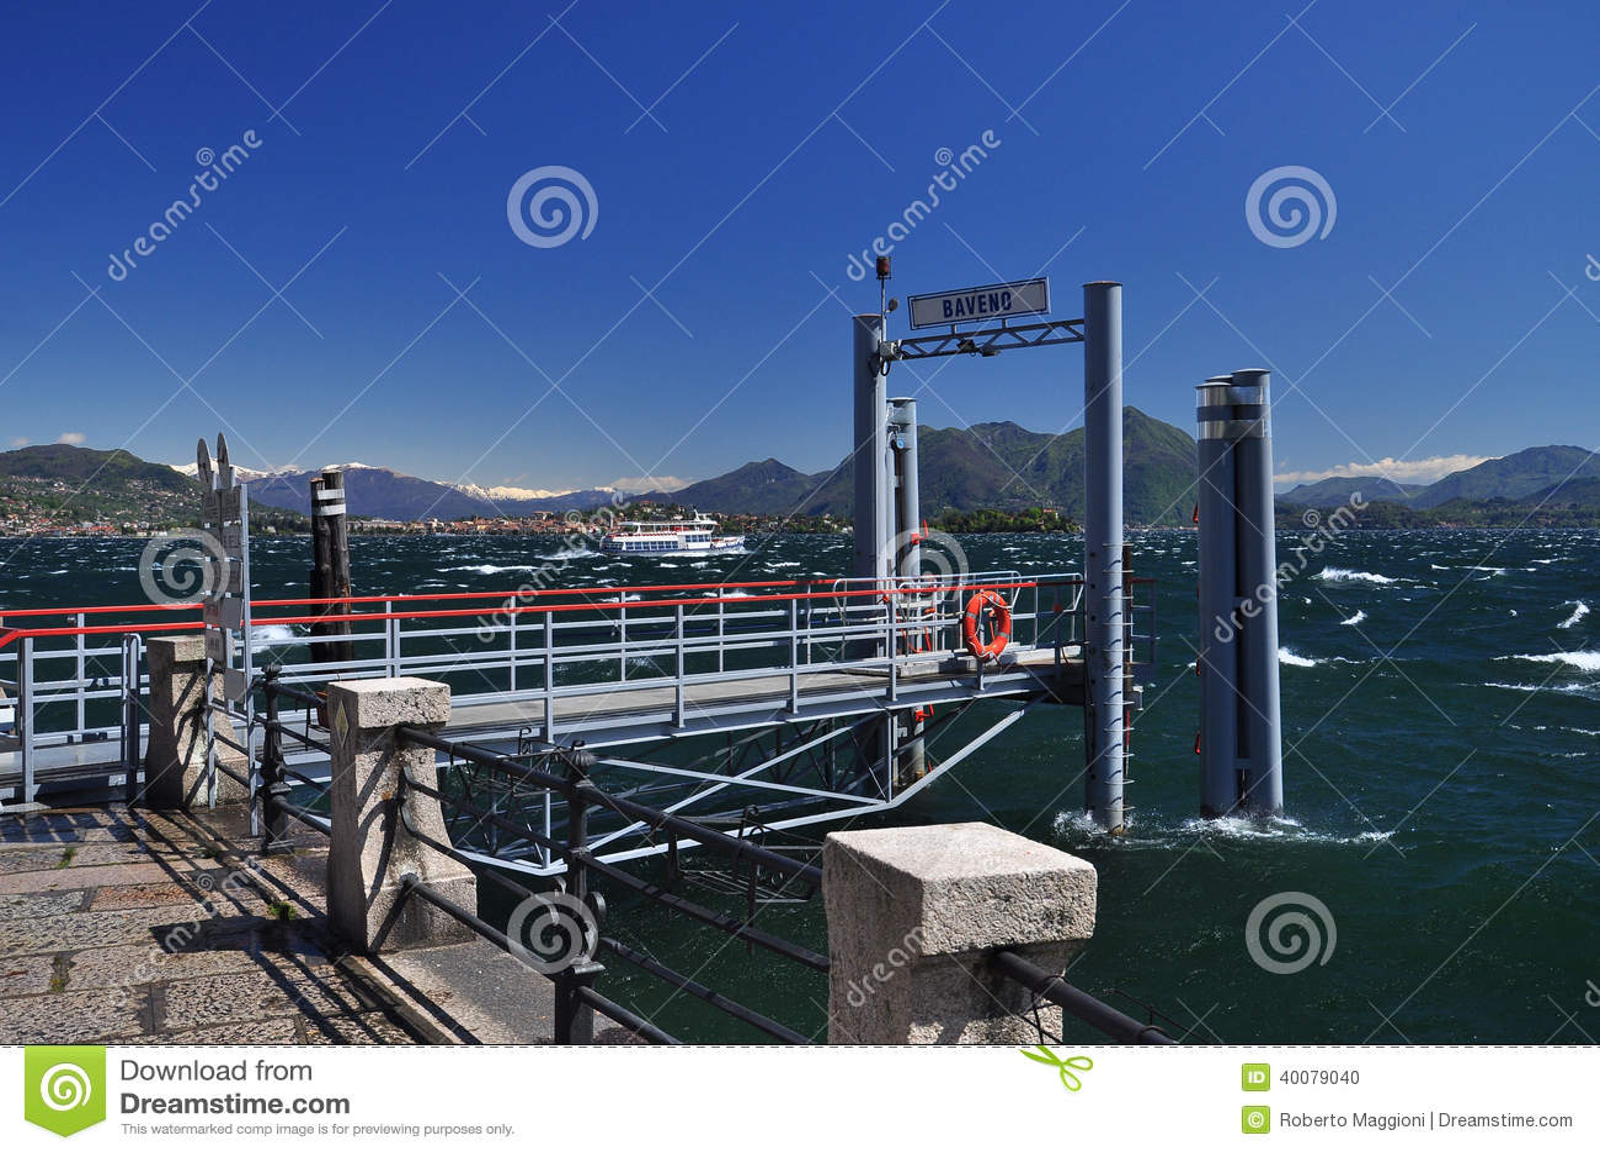 Cais da balsa de Baveno, lago Maggiore. Tempo ventoso